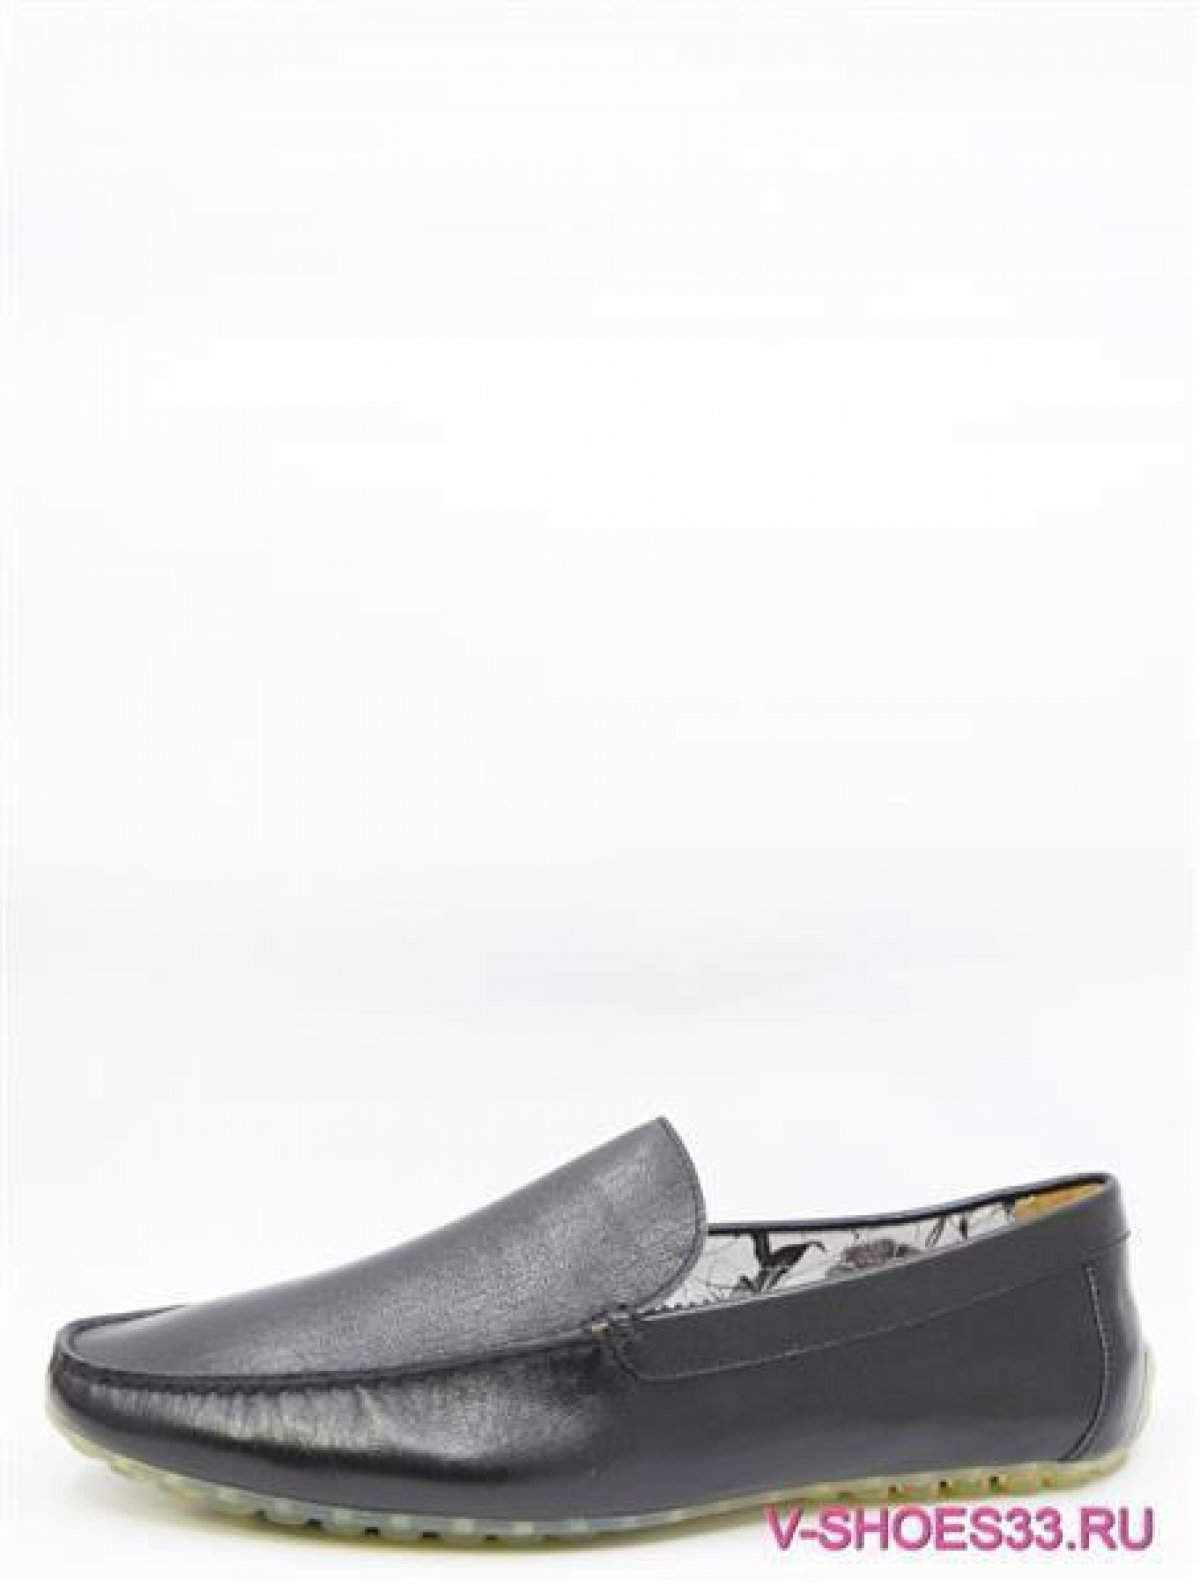 K87-075388 мужские туфли